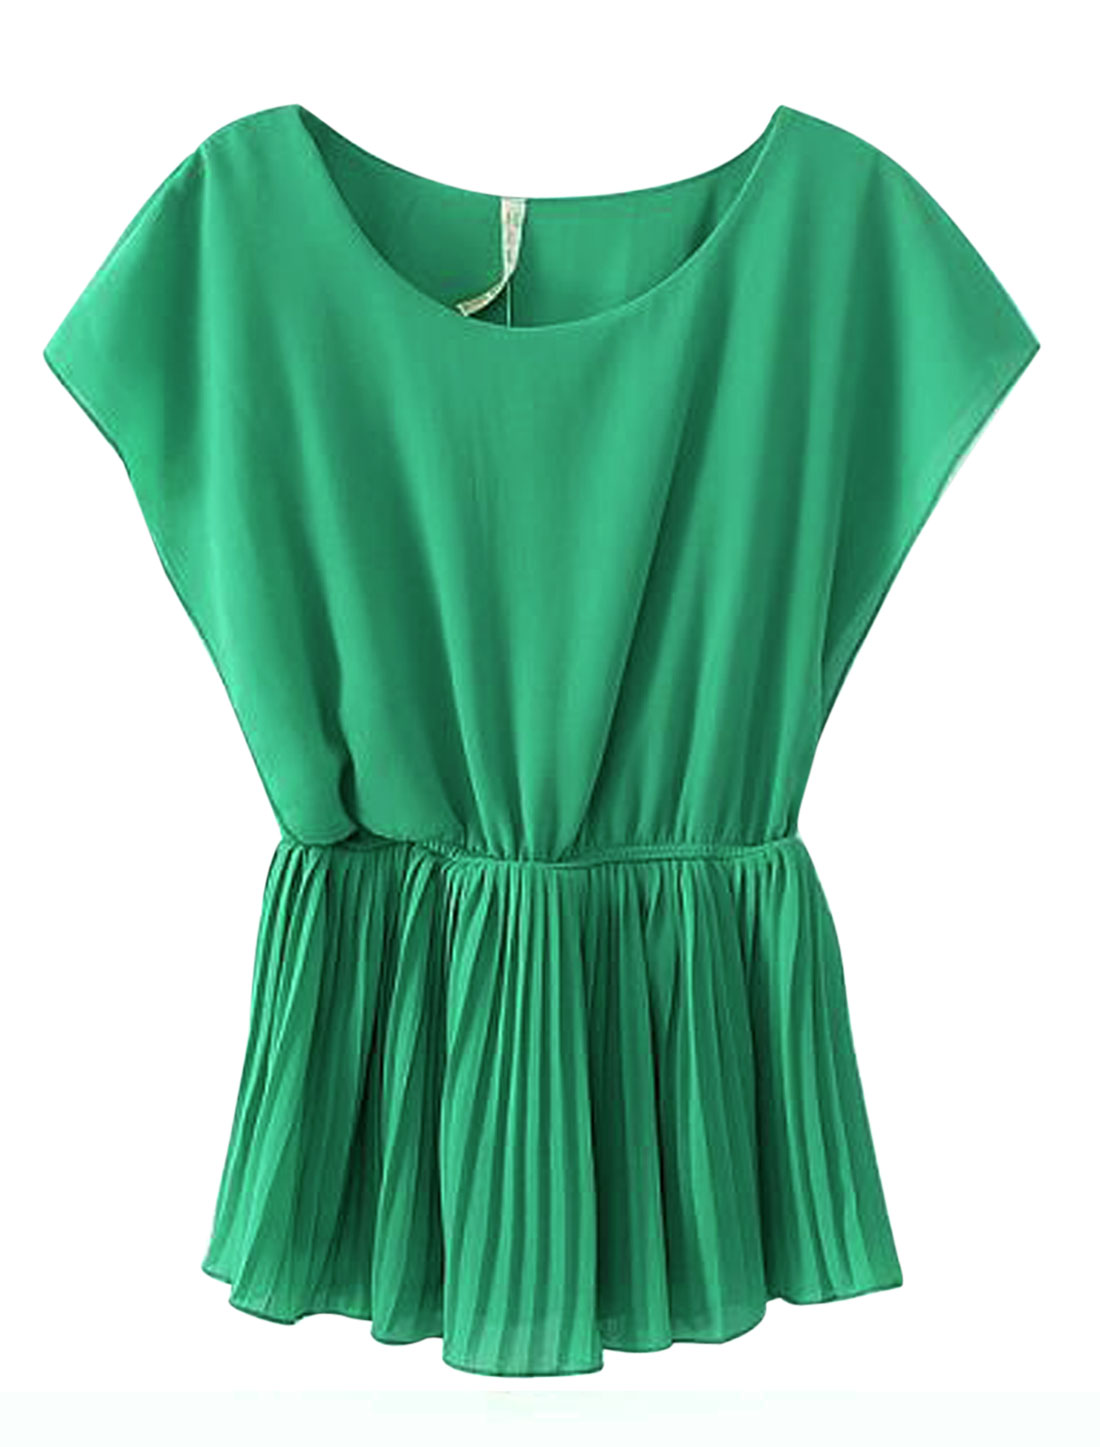 Lady Fashionable Sleeveless Elastic Waist Pleated Blouse Green XS